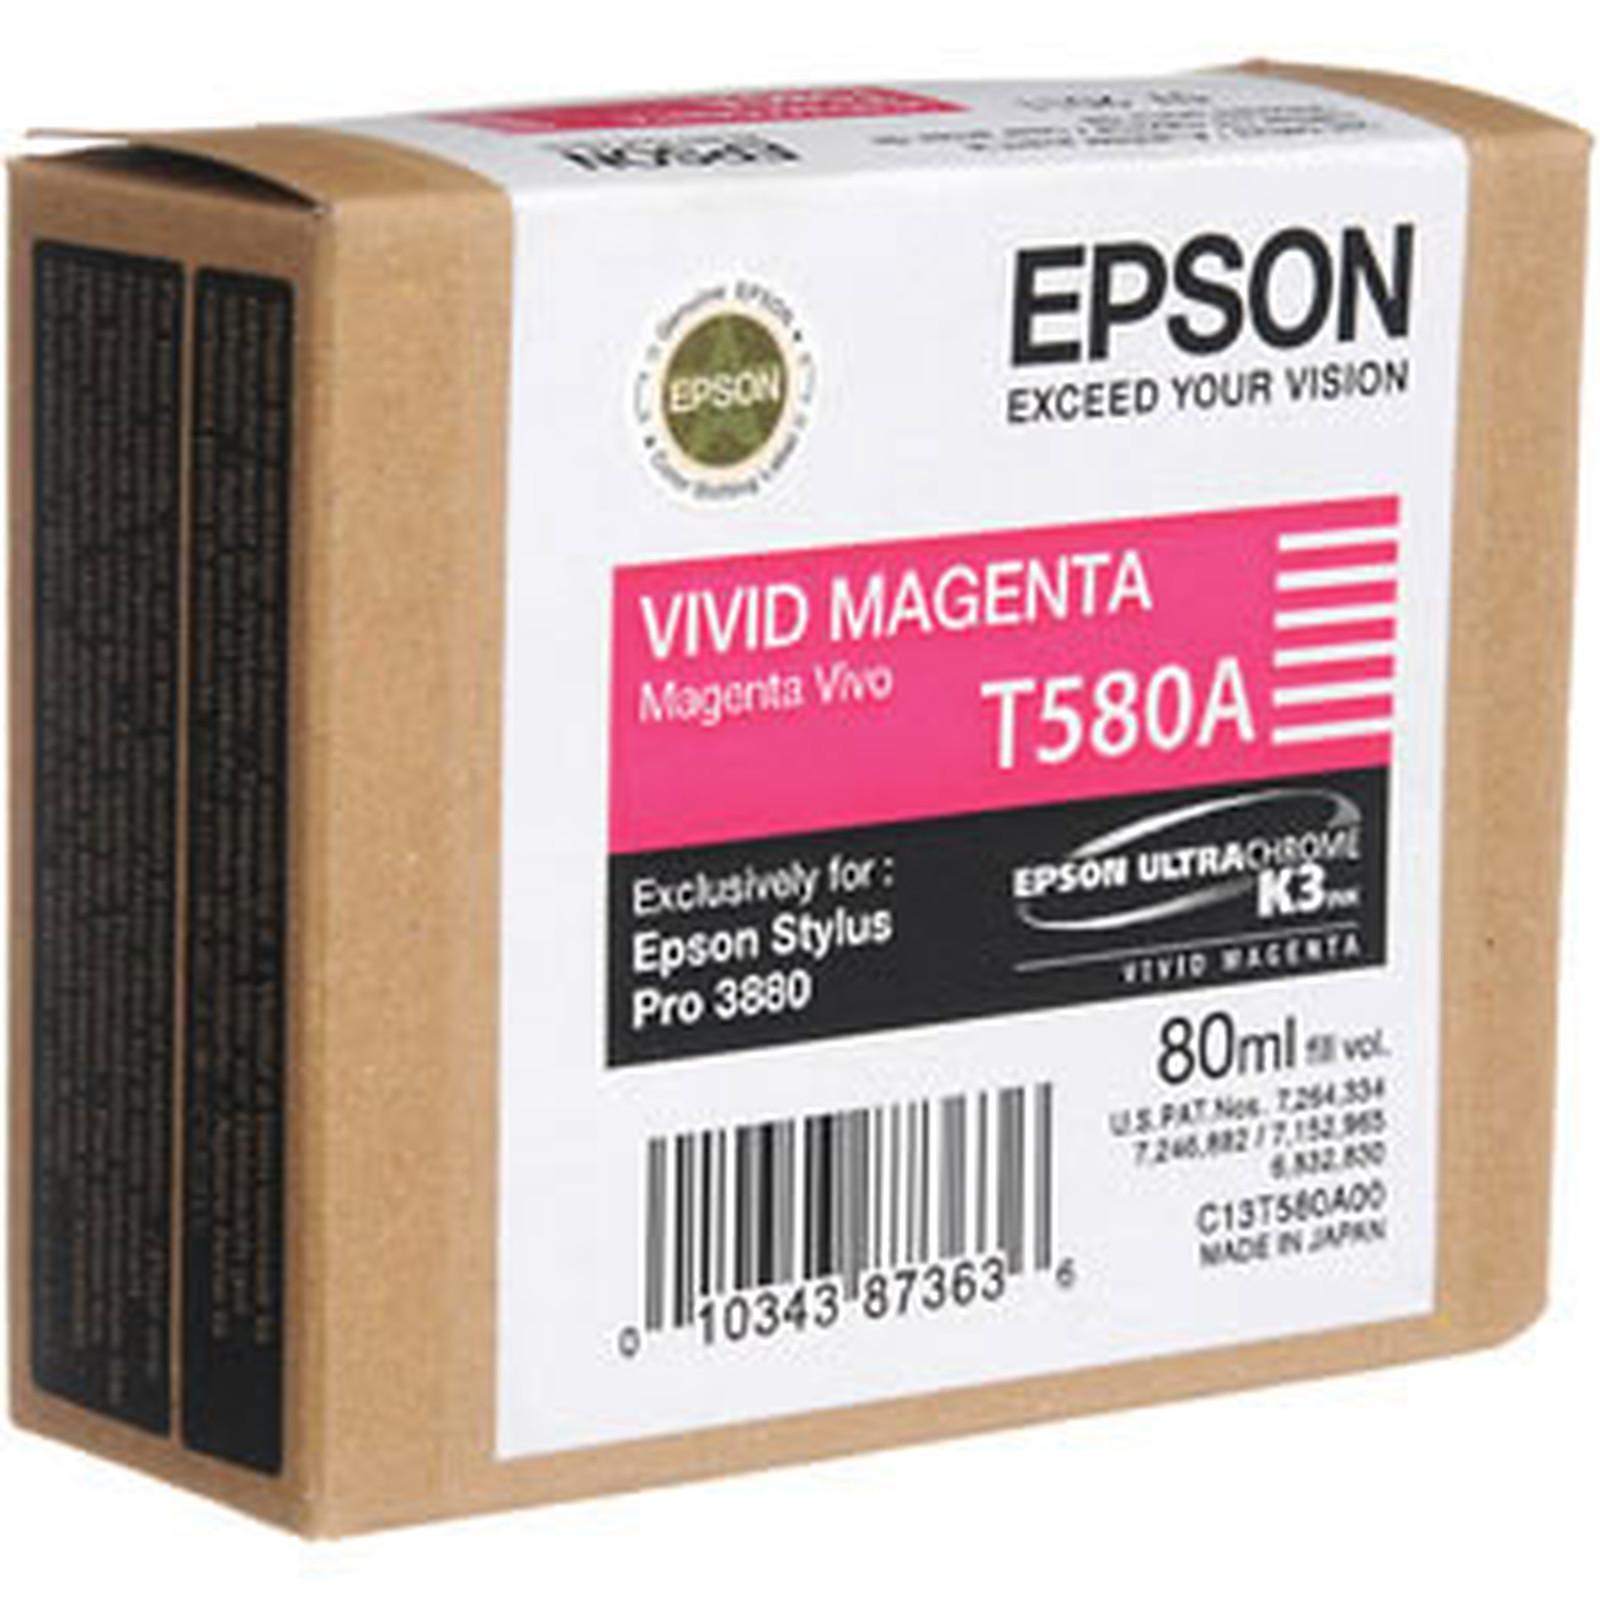 Epson T580A